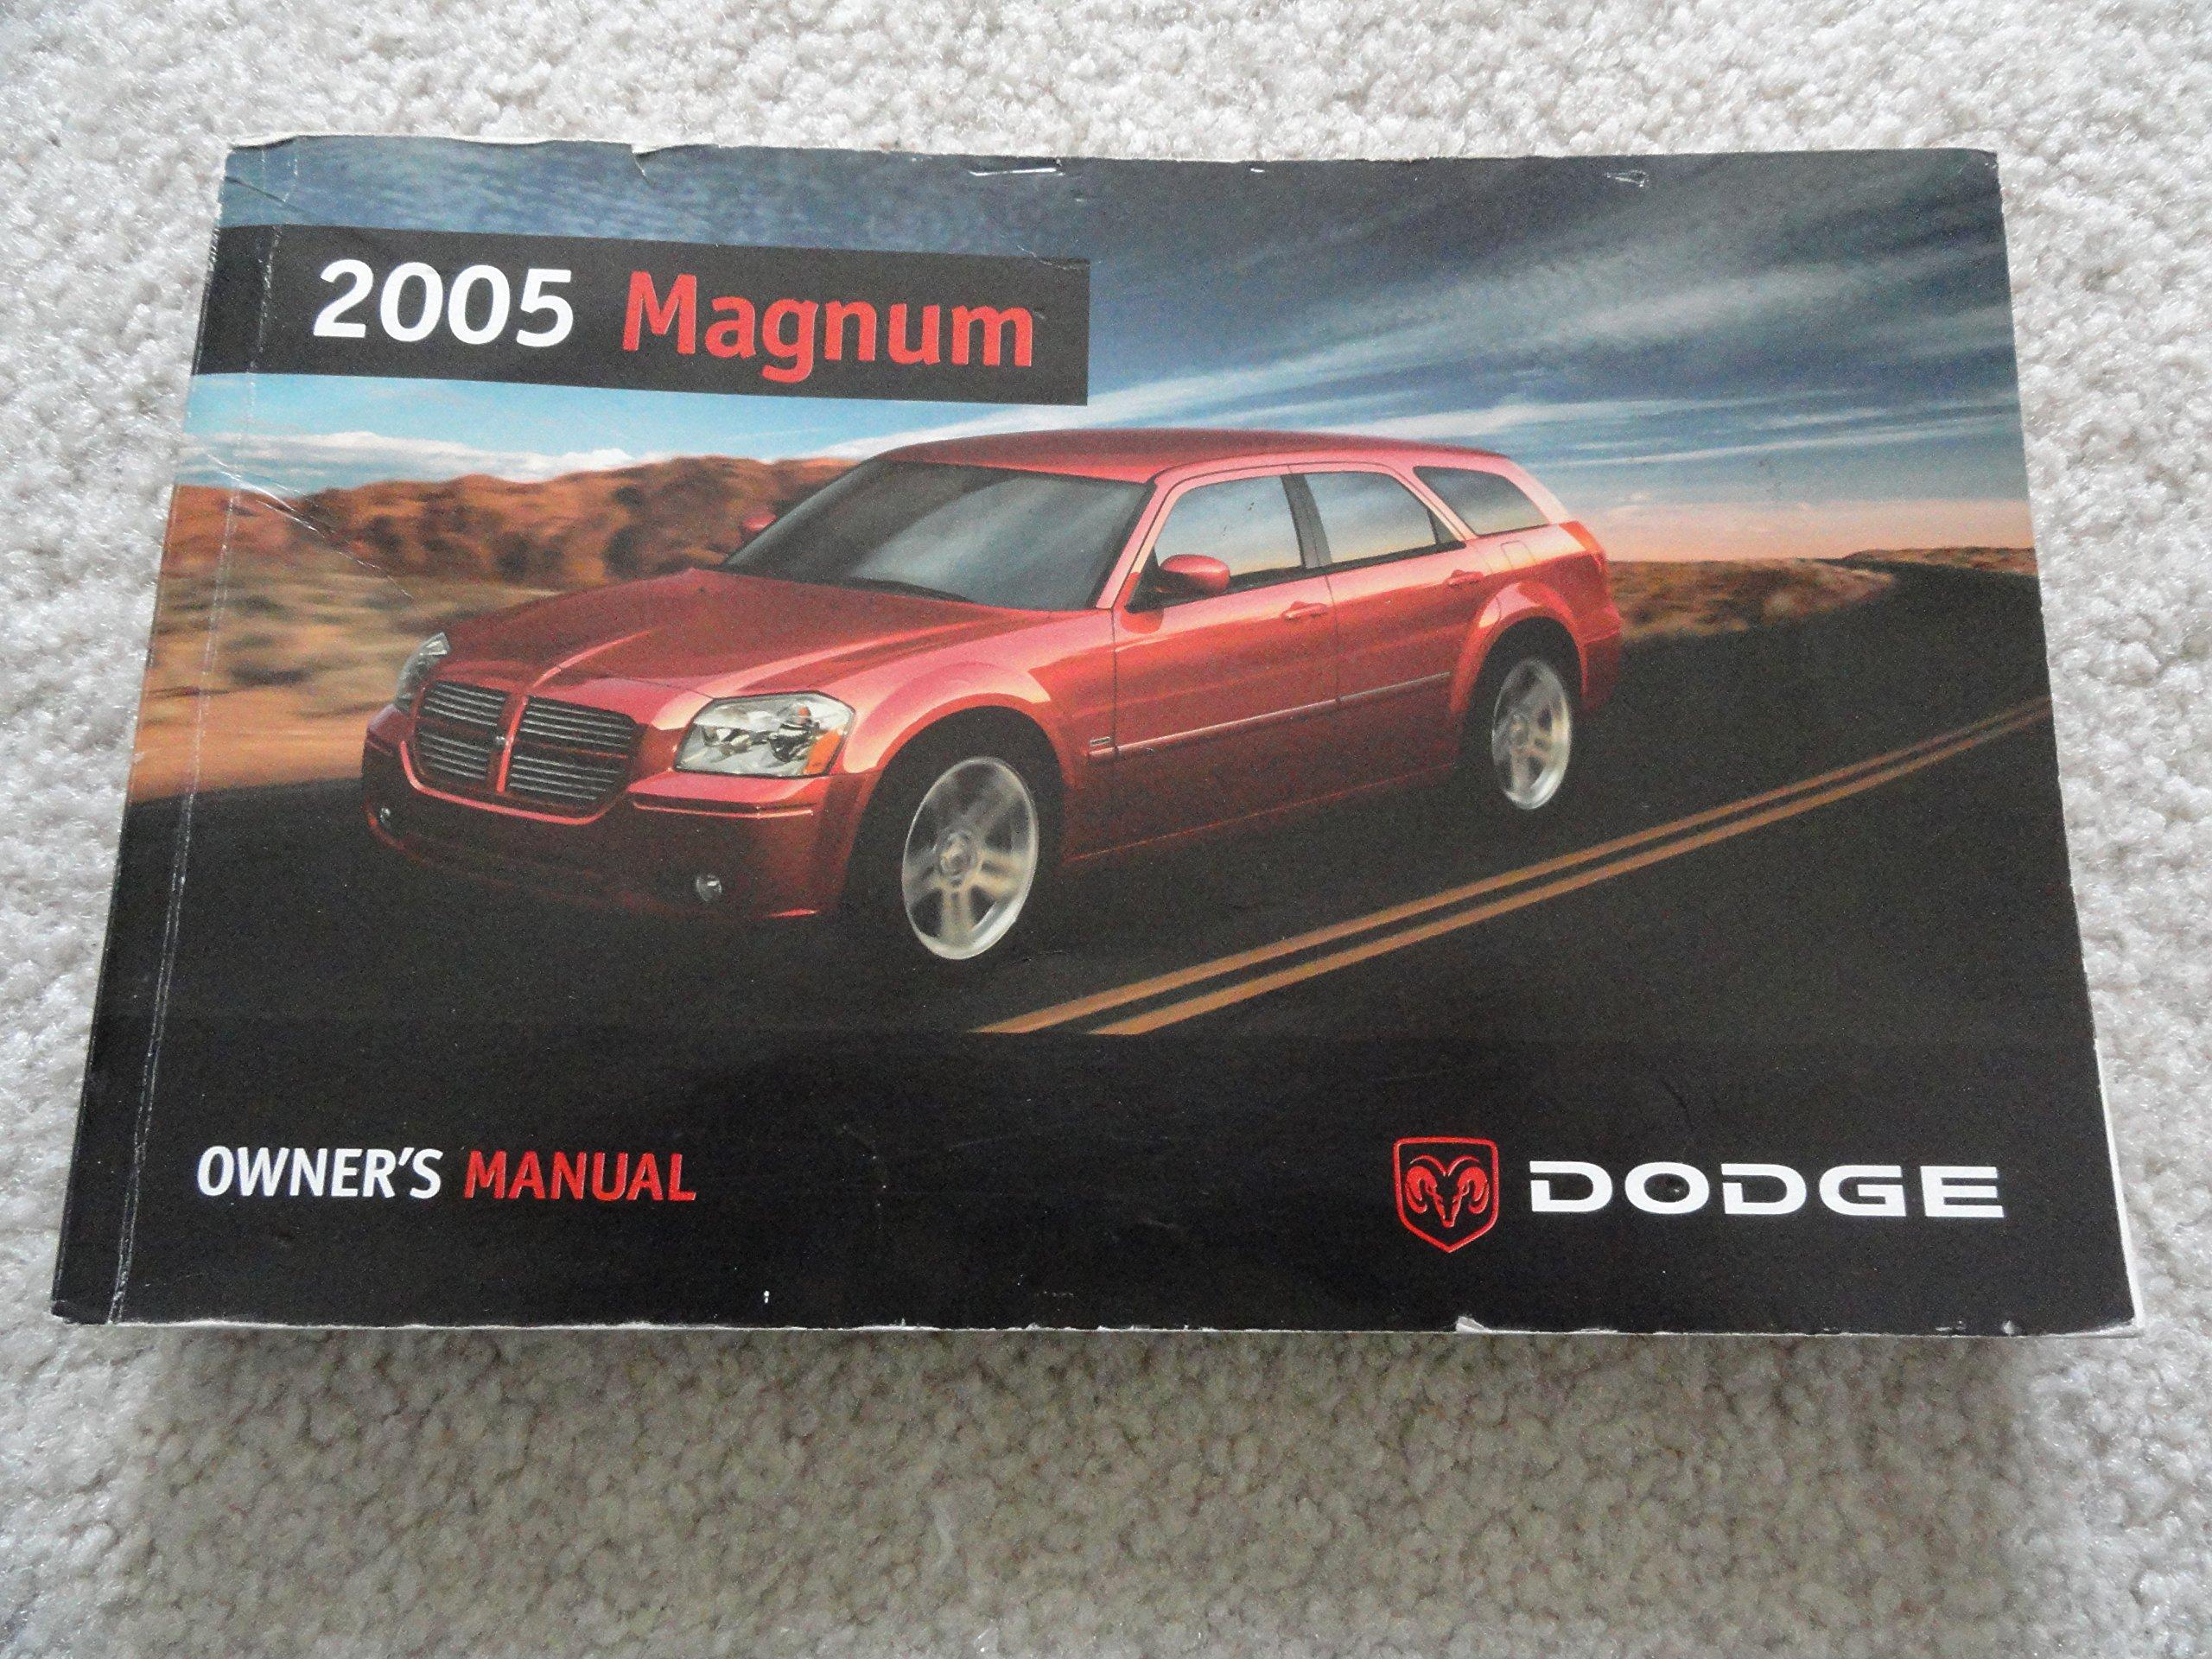 2005 dodge magnum owners manual dodge amazon com books rh amazon com 2005 Dodge Magnum SE 2005 polaris magnum 330 owner's manual